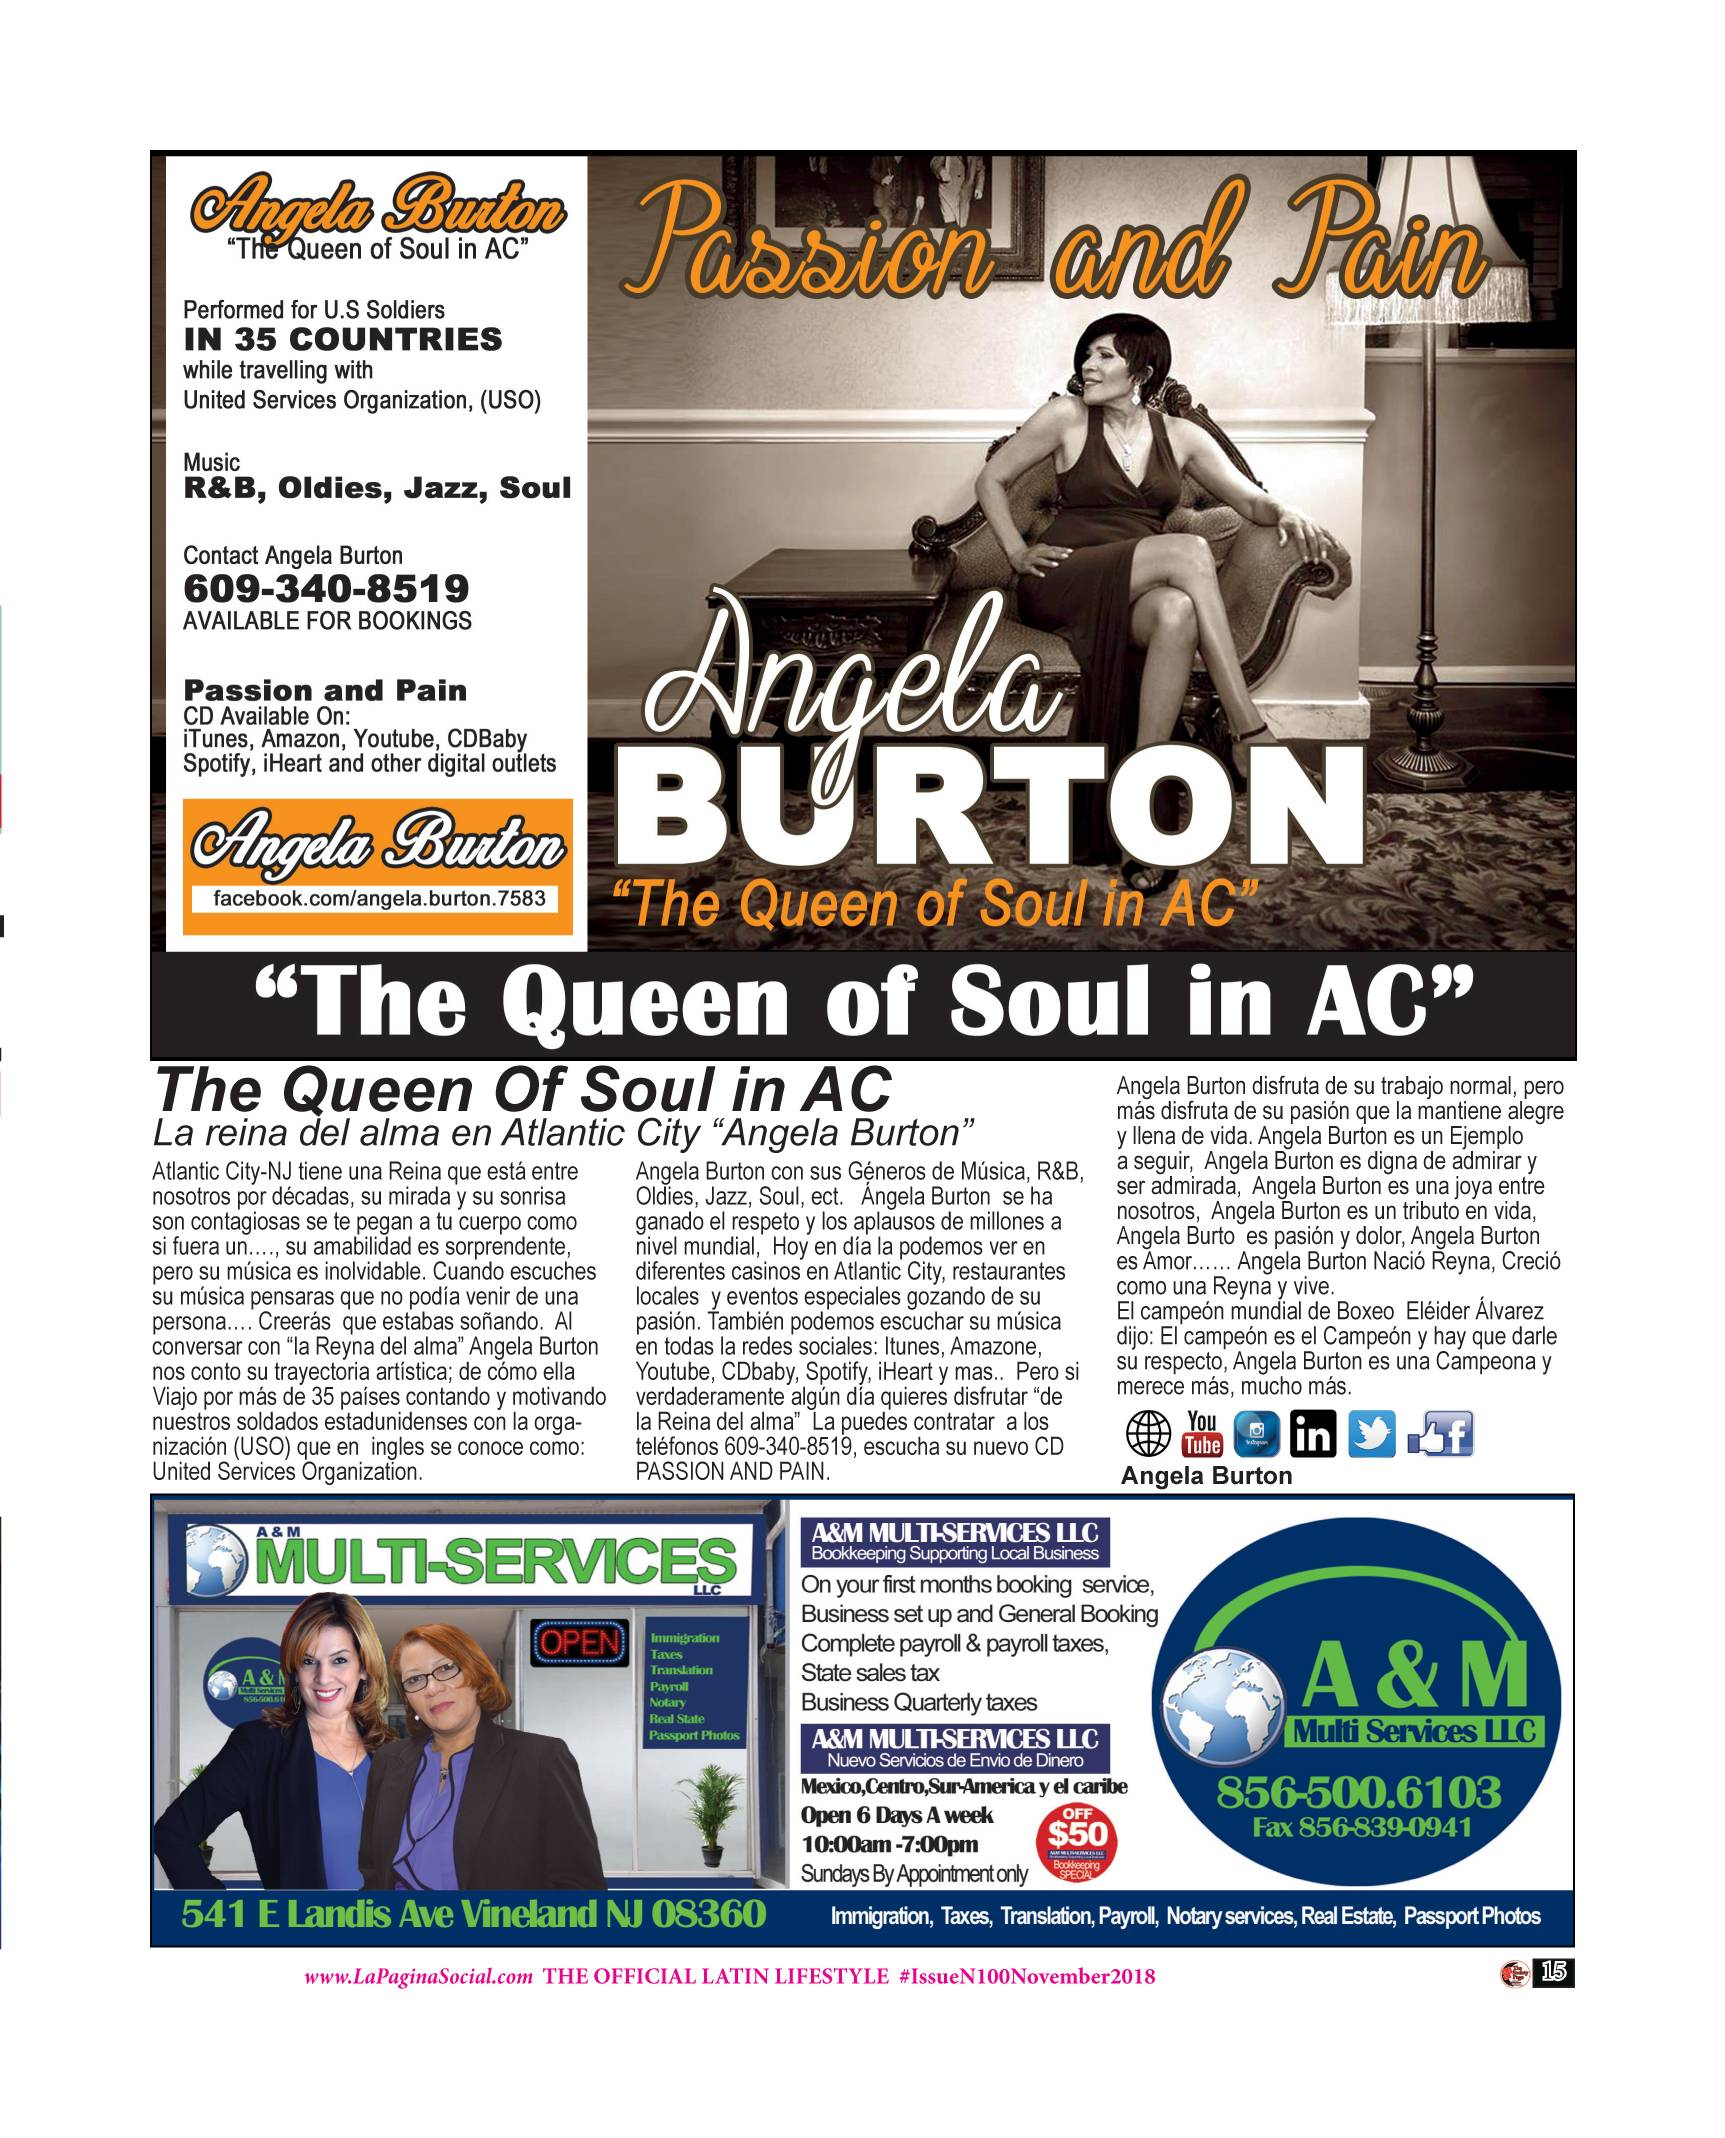 ANGELA BURTON / A&M MULTISERVICES LLC